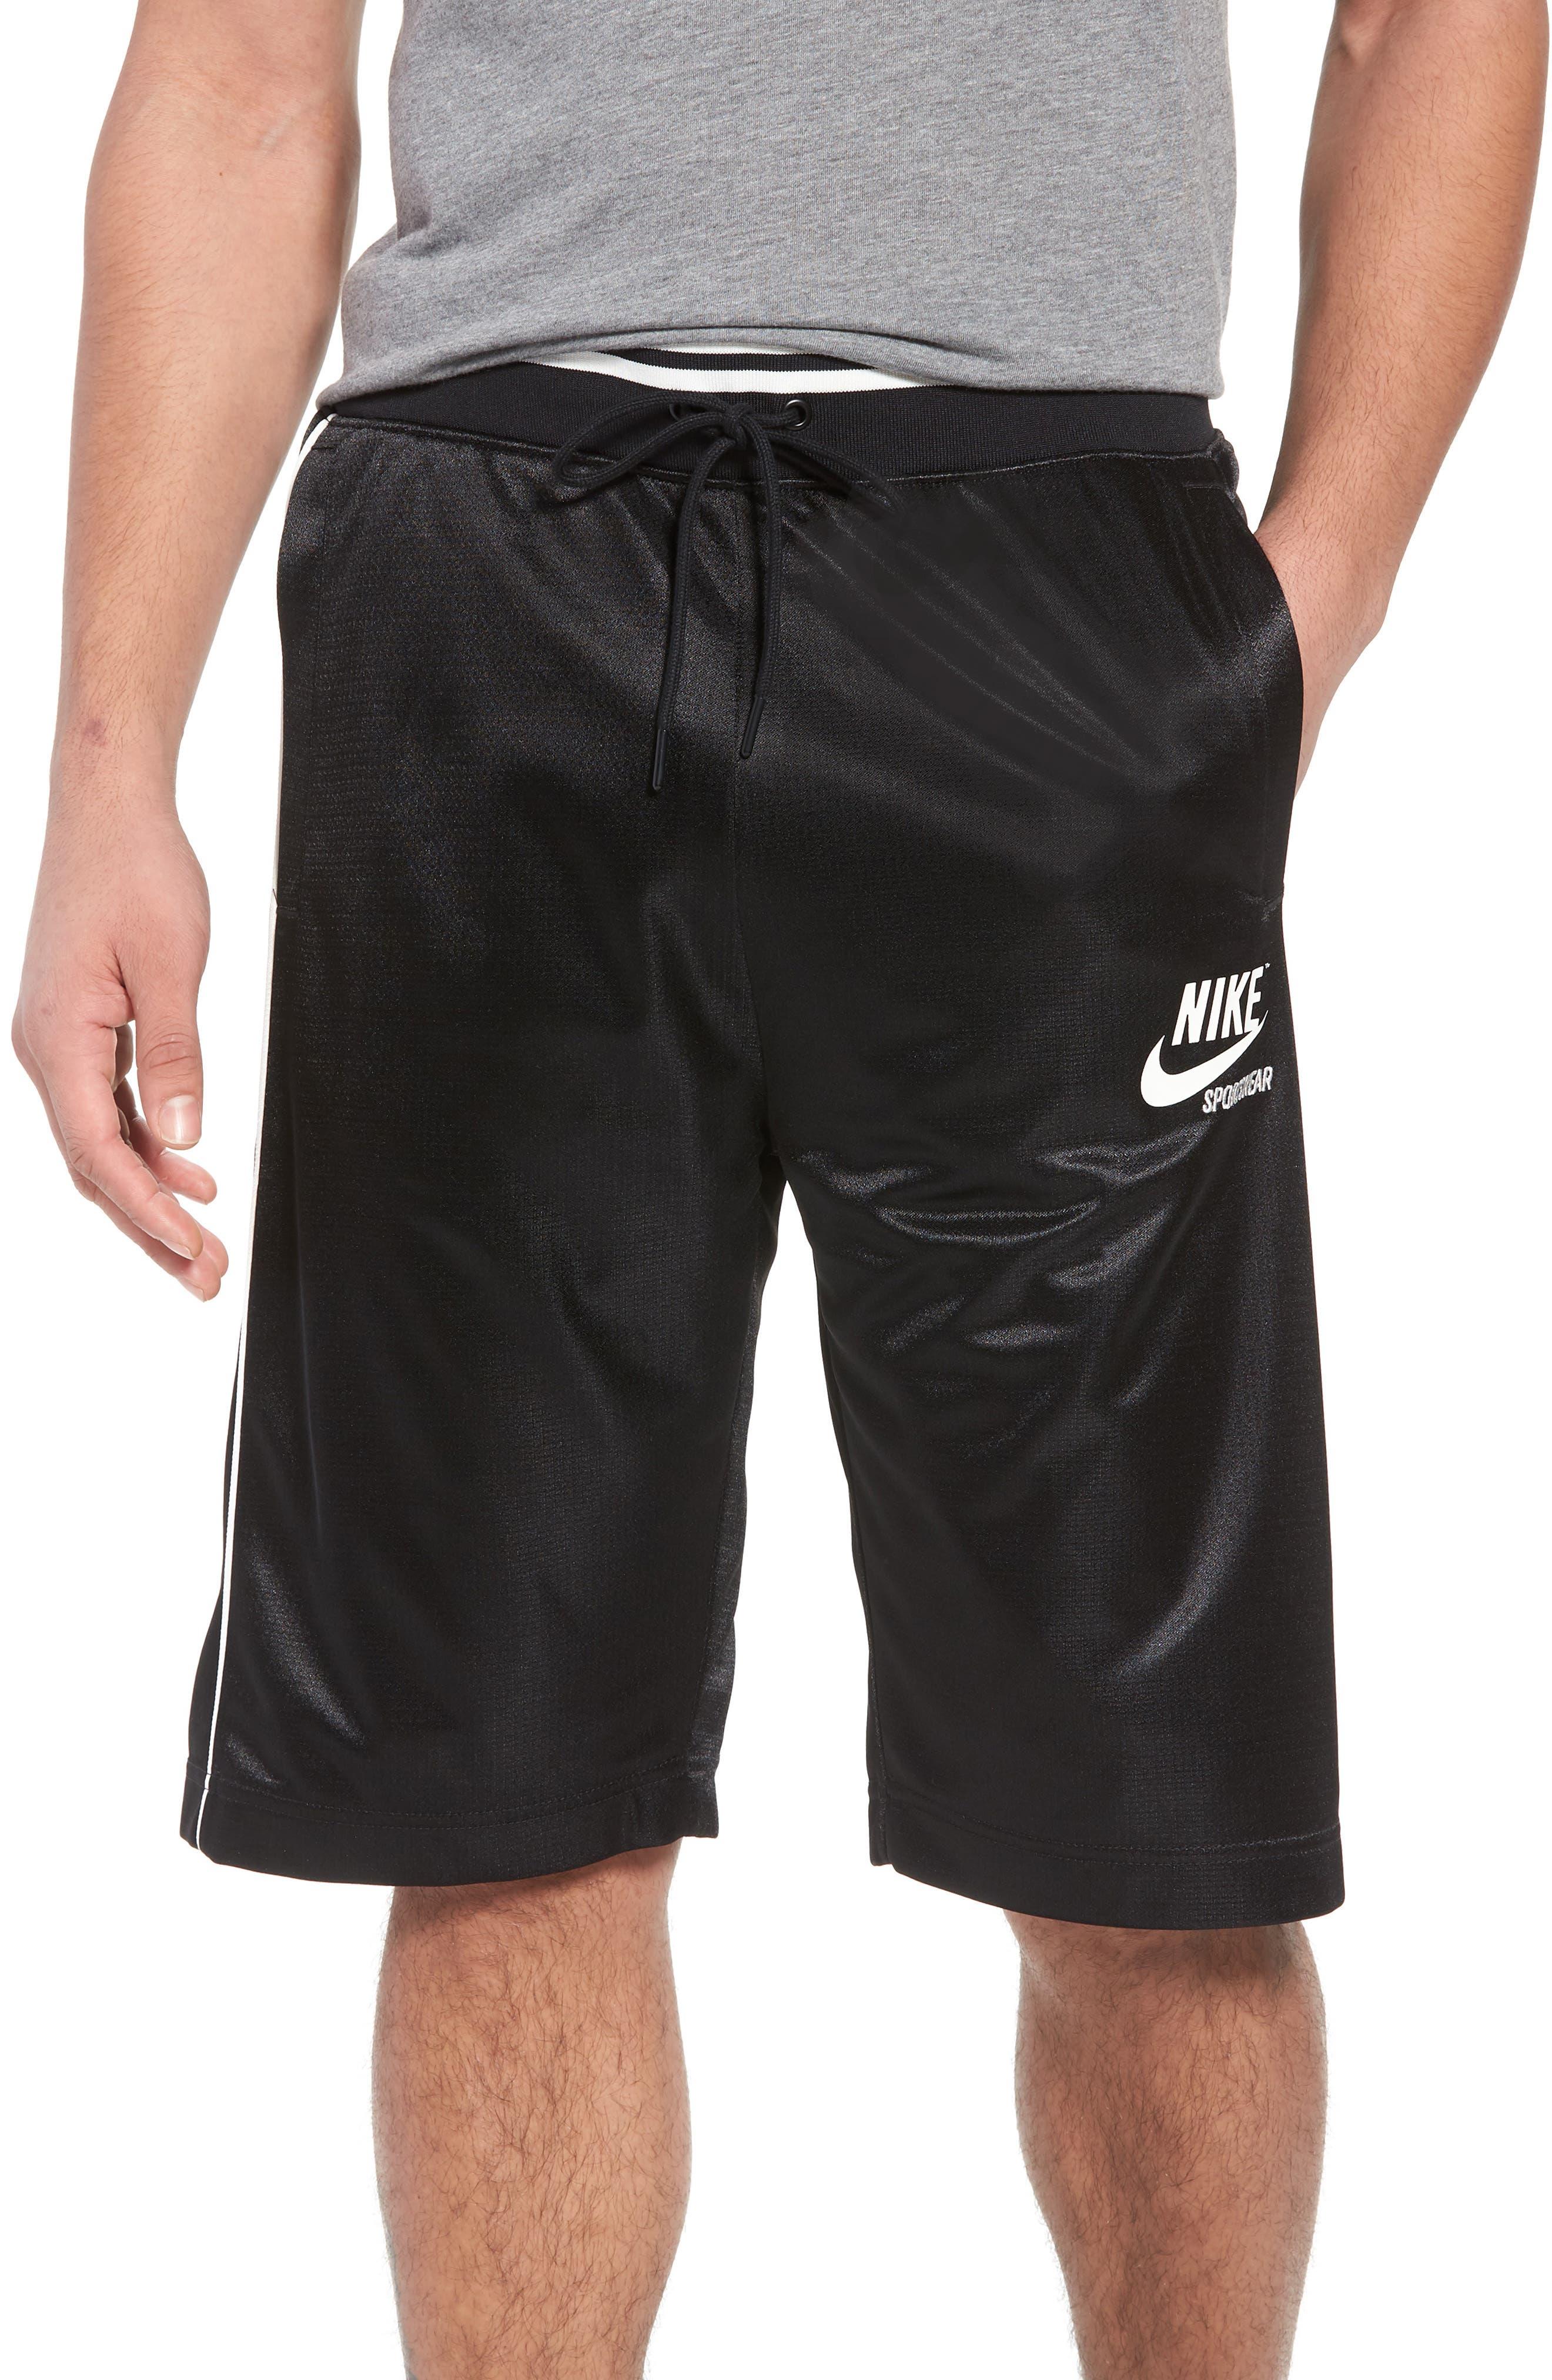 NSW Archive Shorts,                         Main,                         color, BLACK/ SAIL/ SAIL